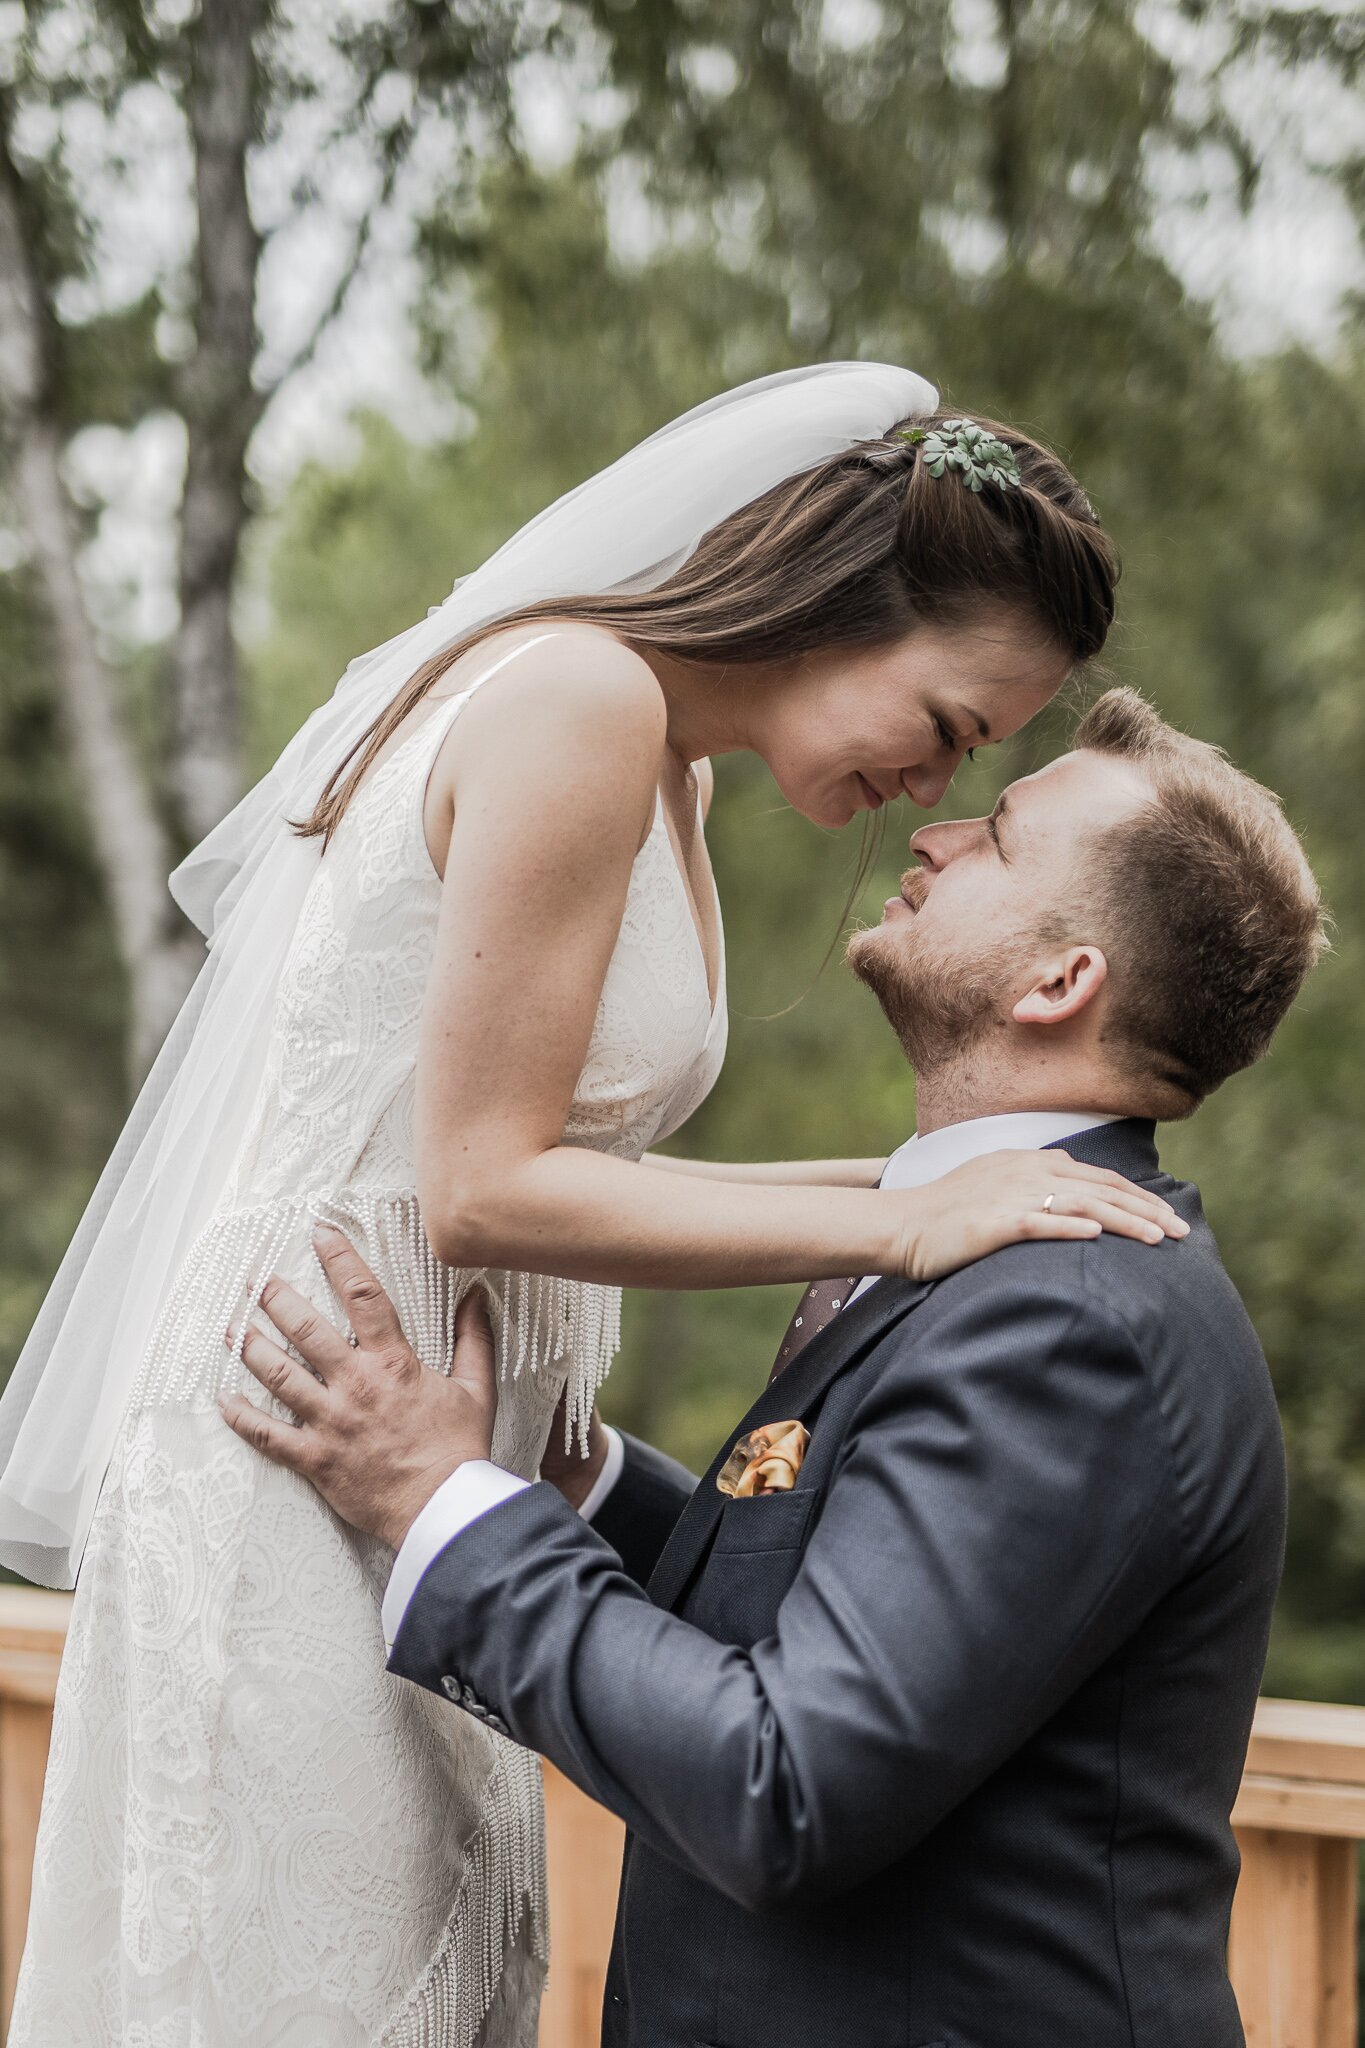 Sesja ślubna - Marta i Kuba - IMG_5868